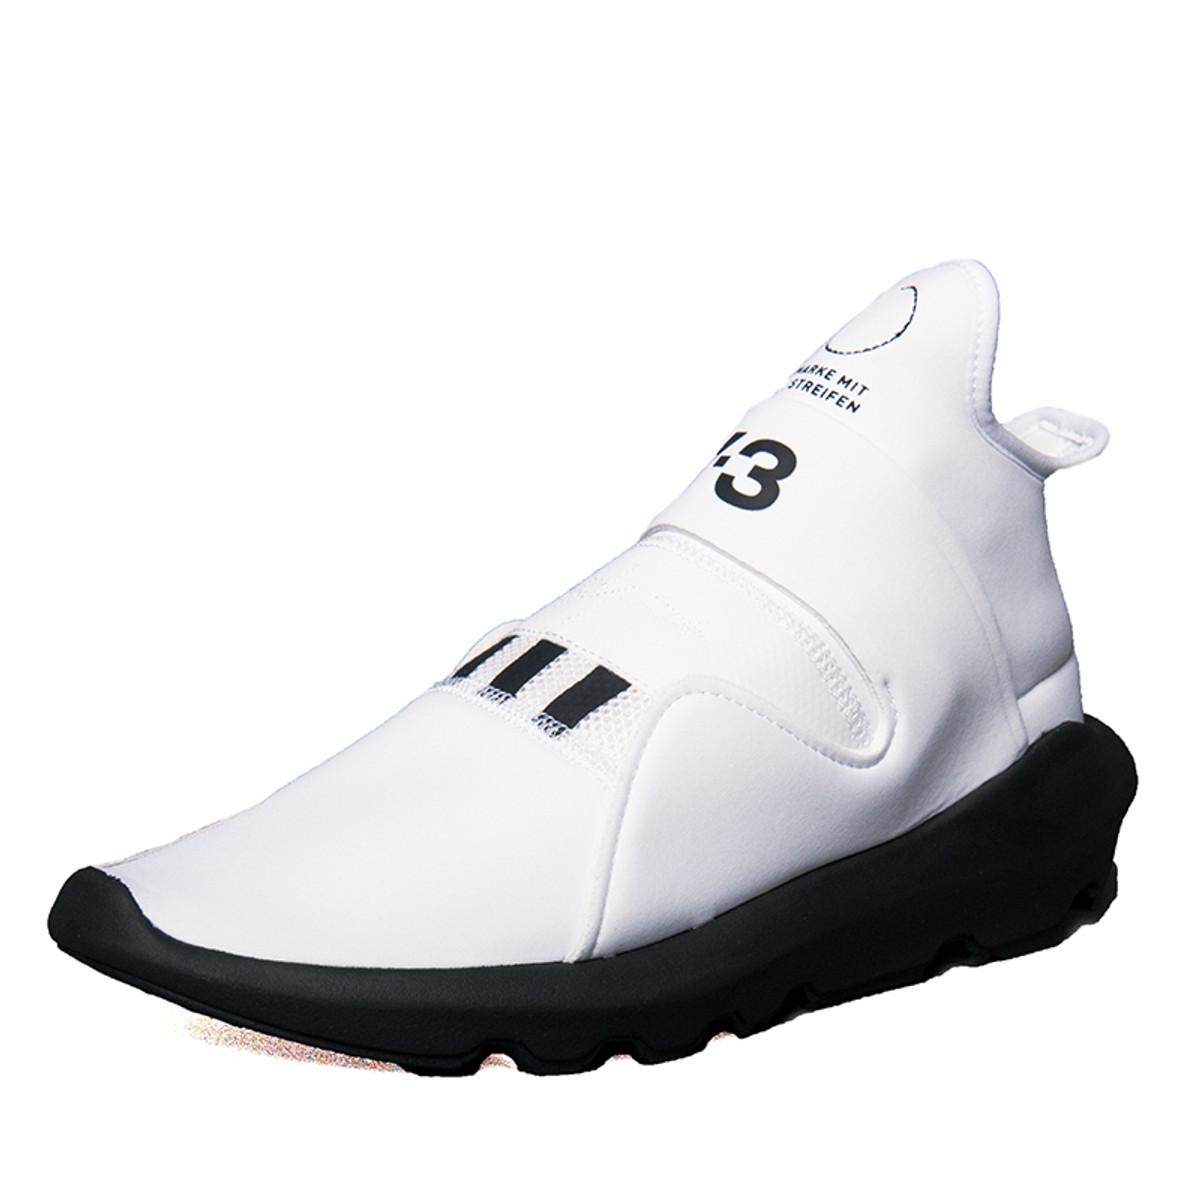 3627fcb4145d Y-3 White Suberou Glove Sneaker for Men